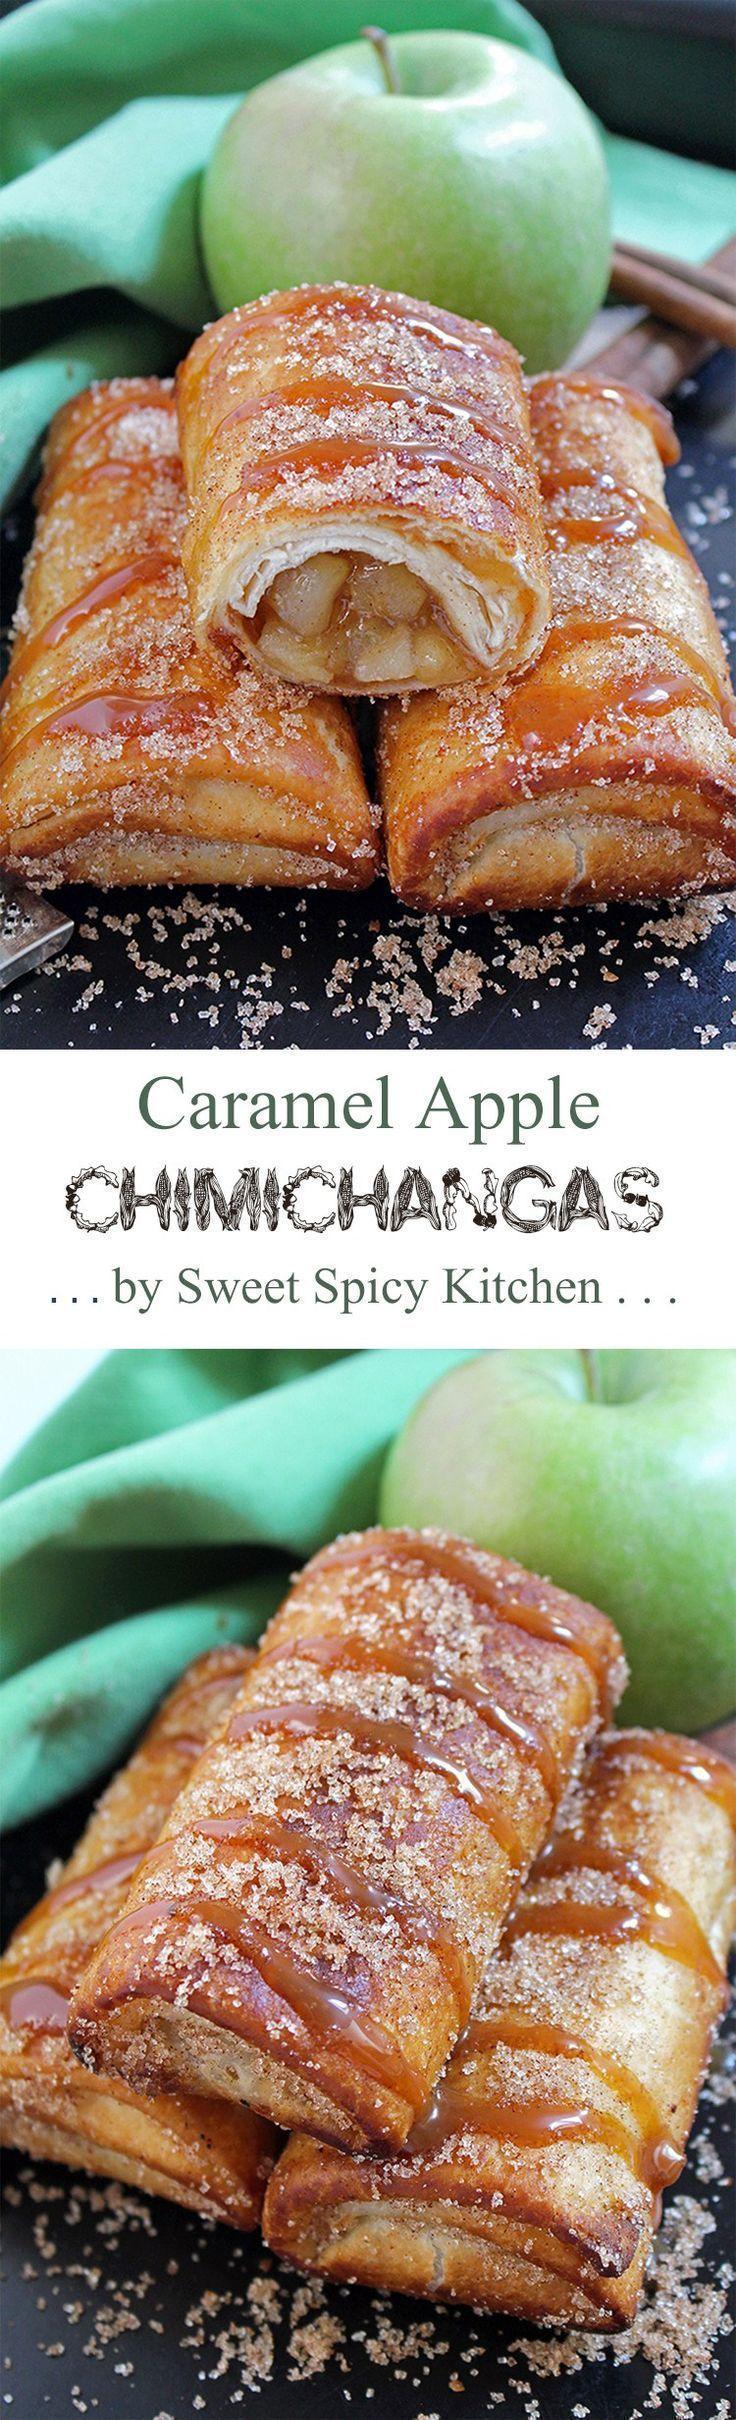 Over 30 Burrito, Chimichanga, and Quesadilla Mexican Recipes #mexicanrecipeswithchicken